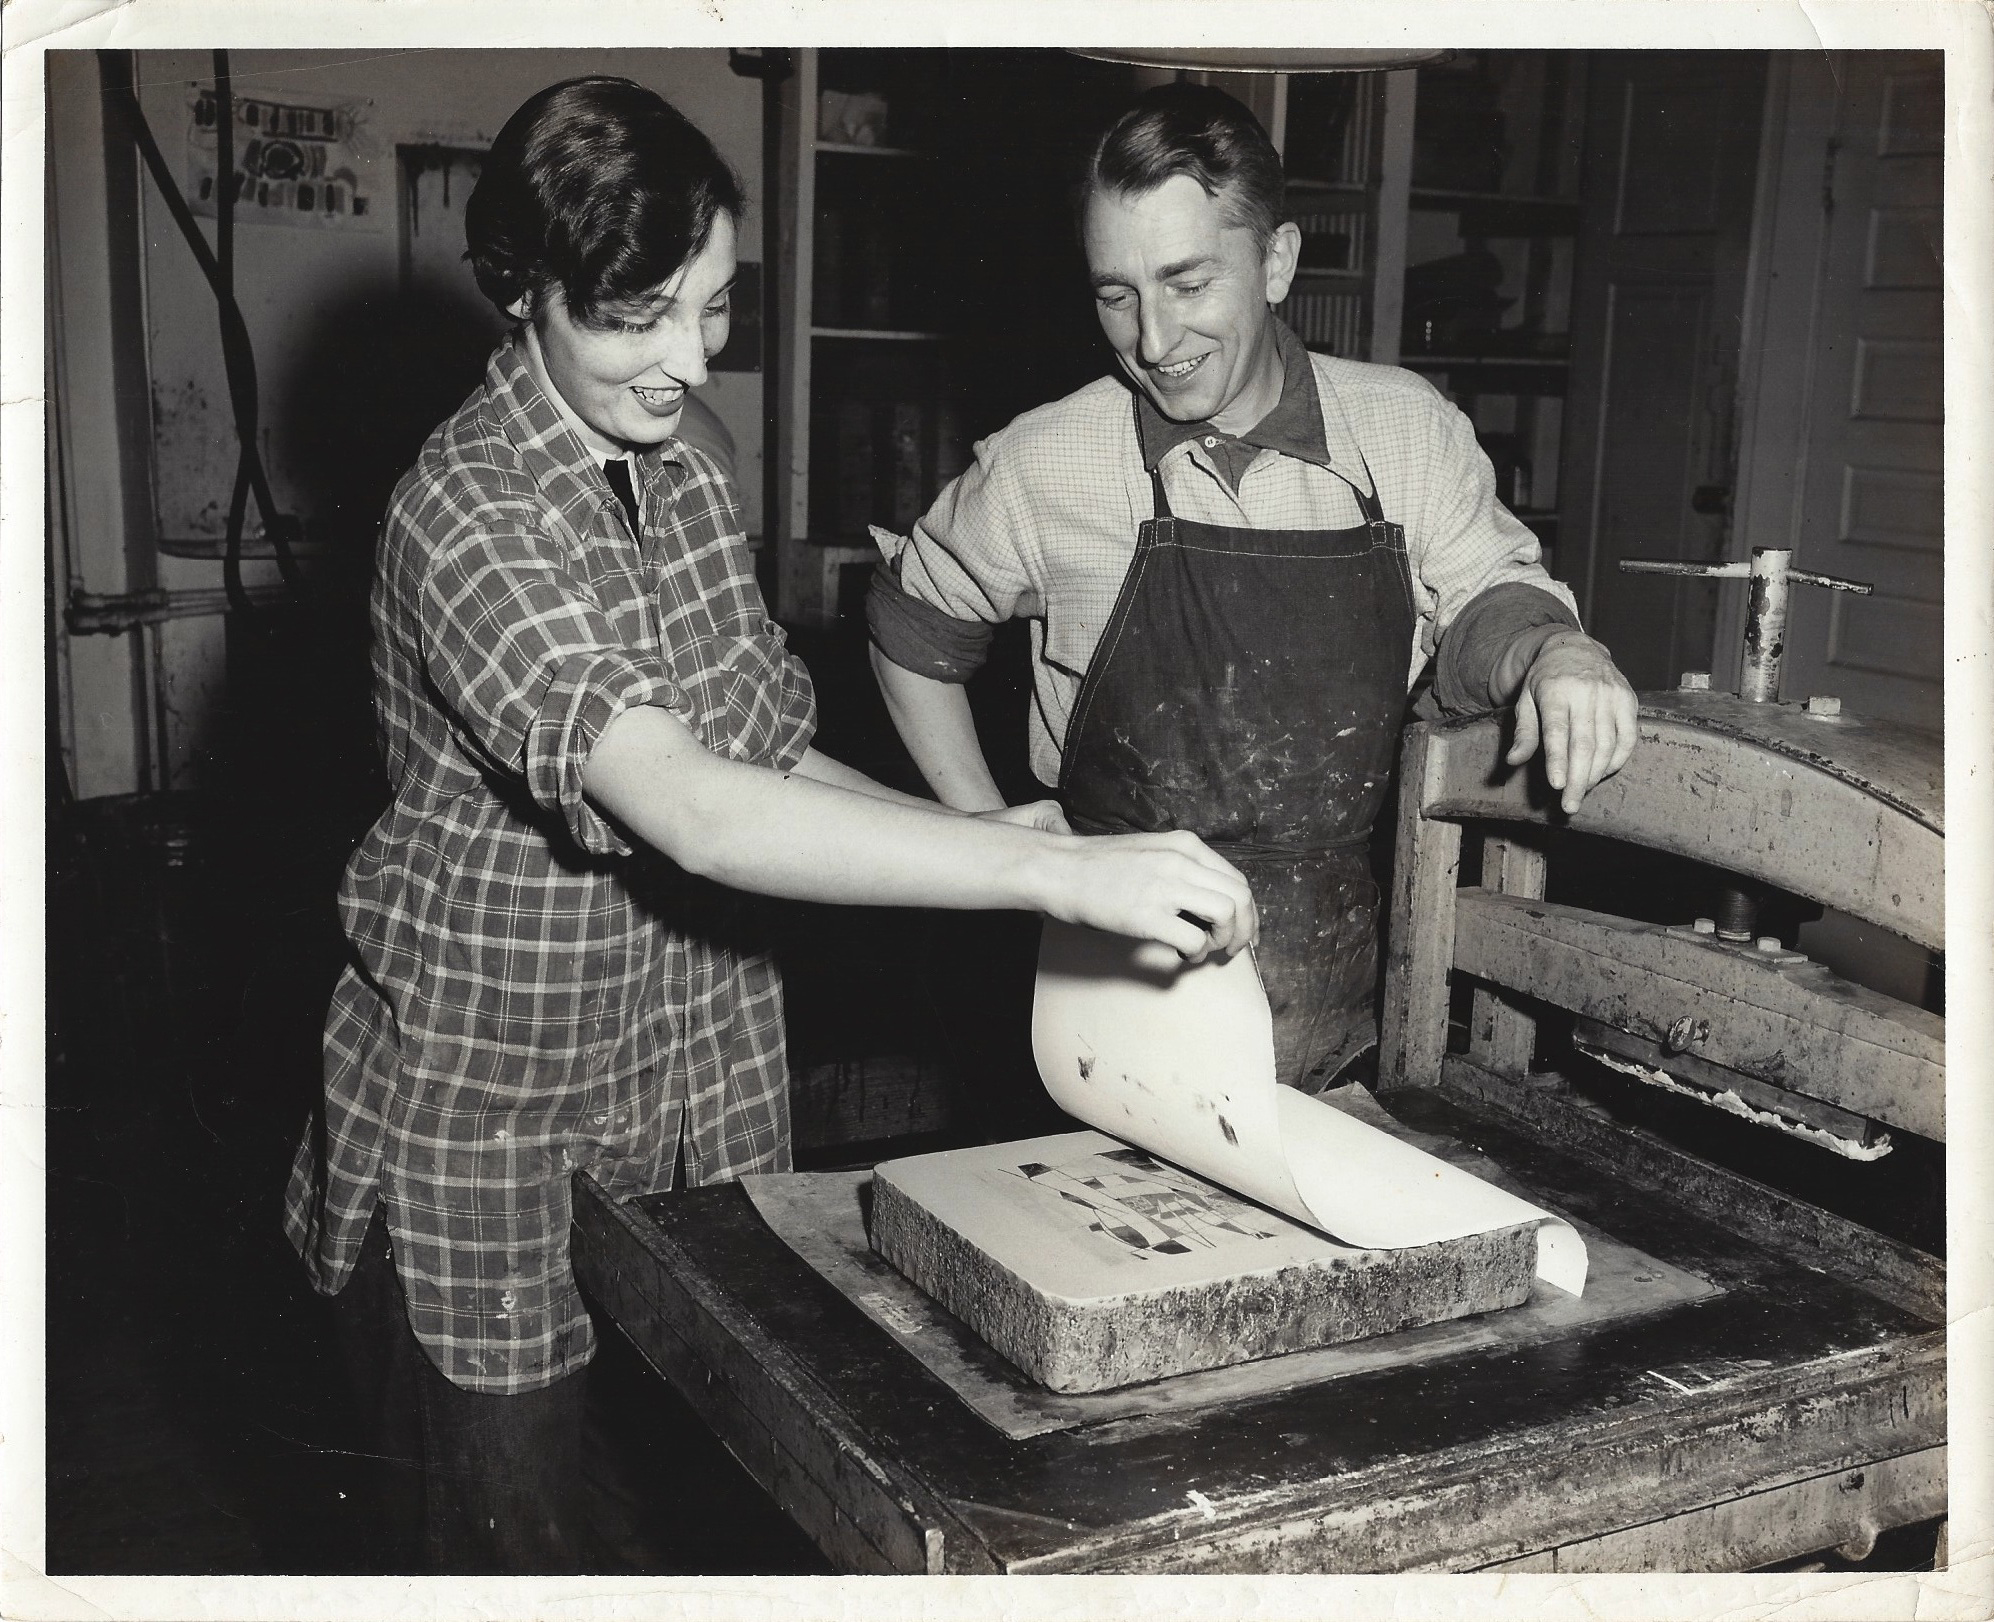 Barbara Pennington proofing a lithograph print with Professor Richard Zoellner.